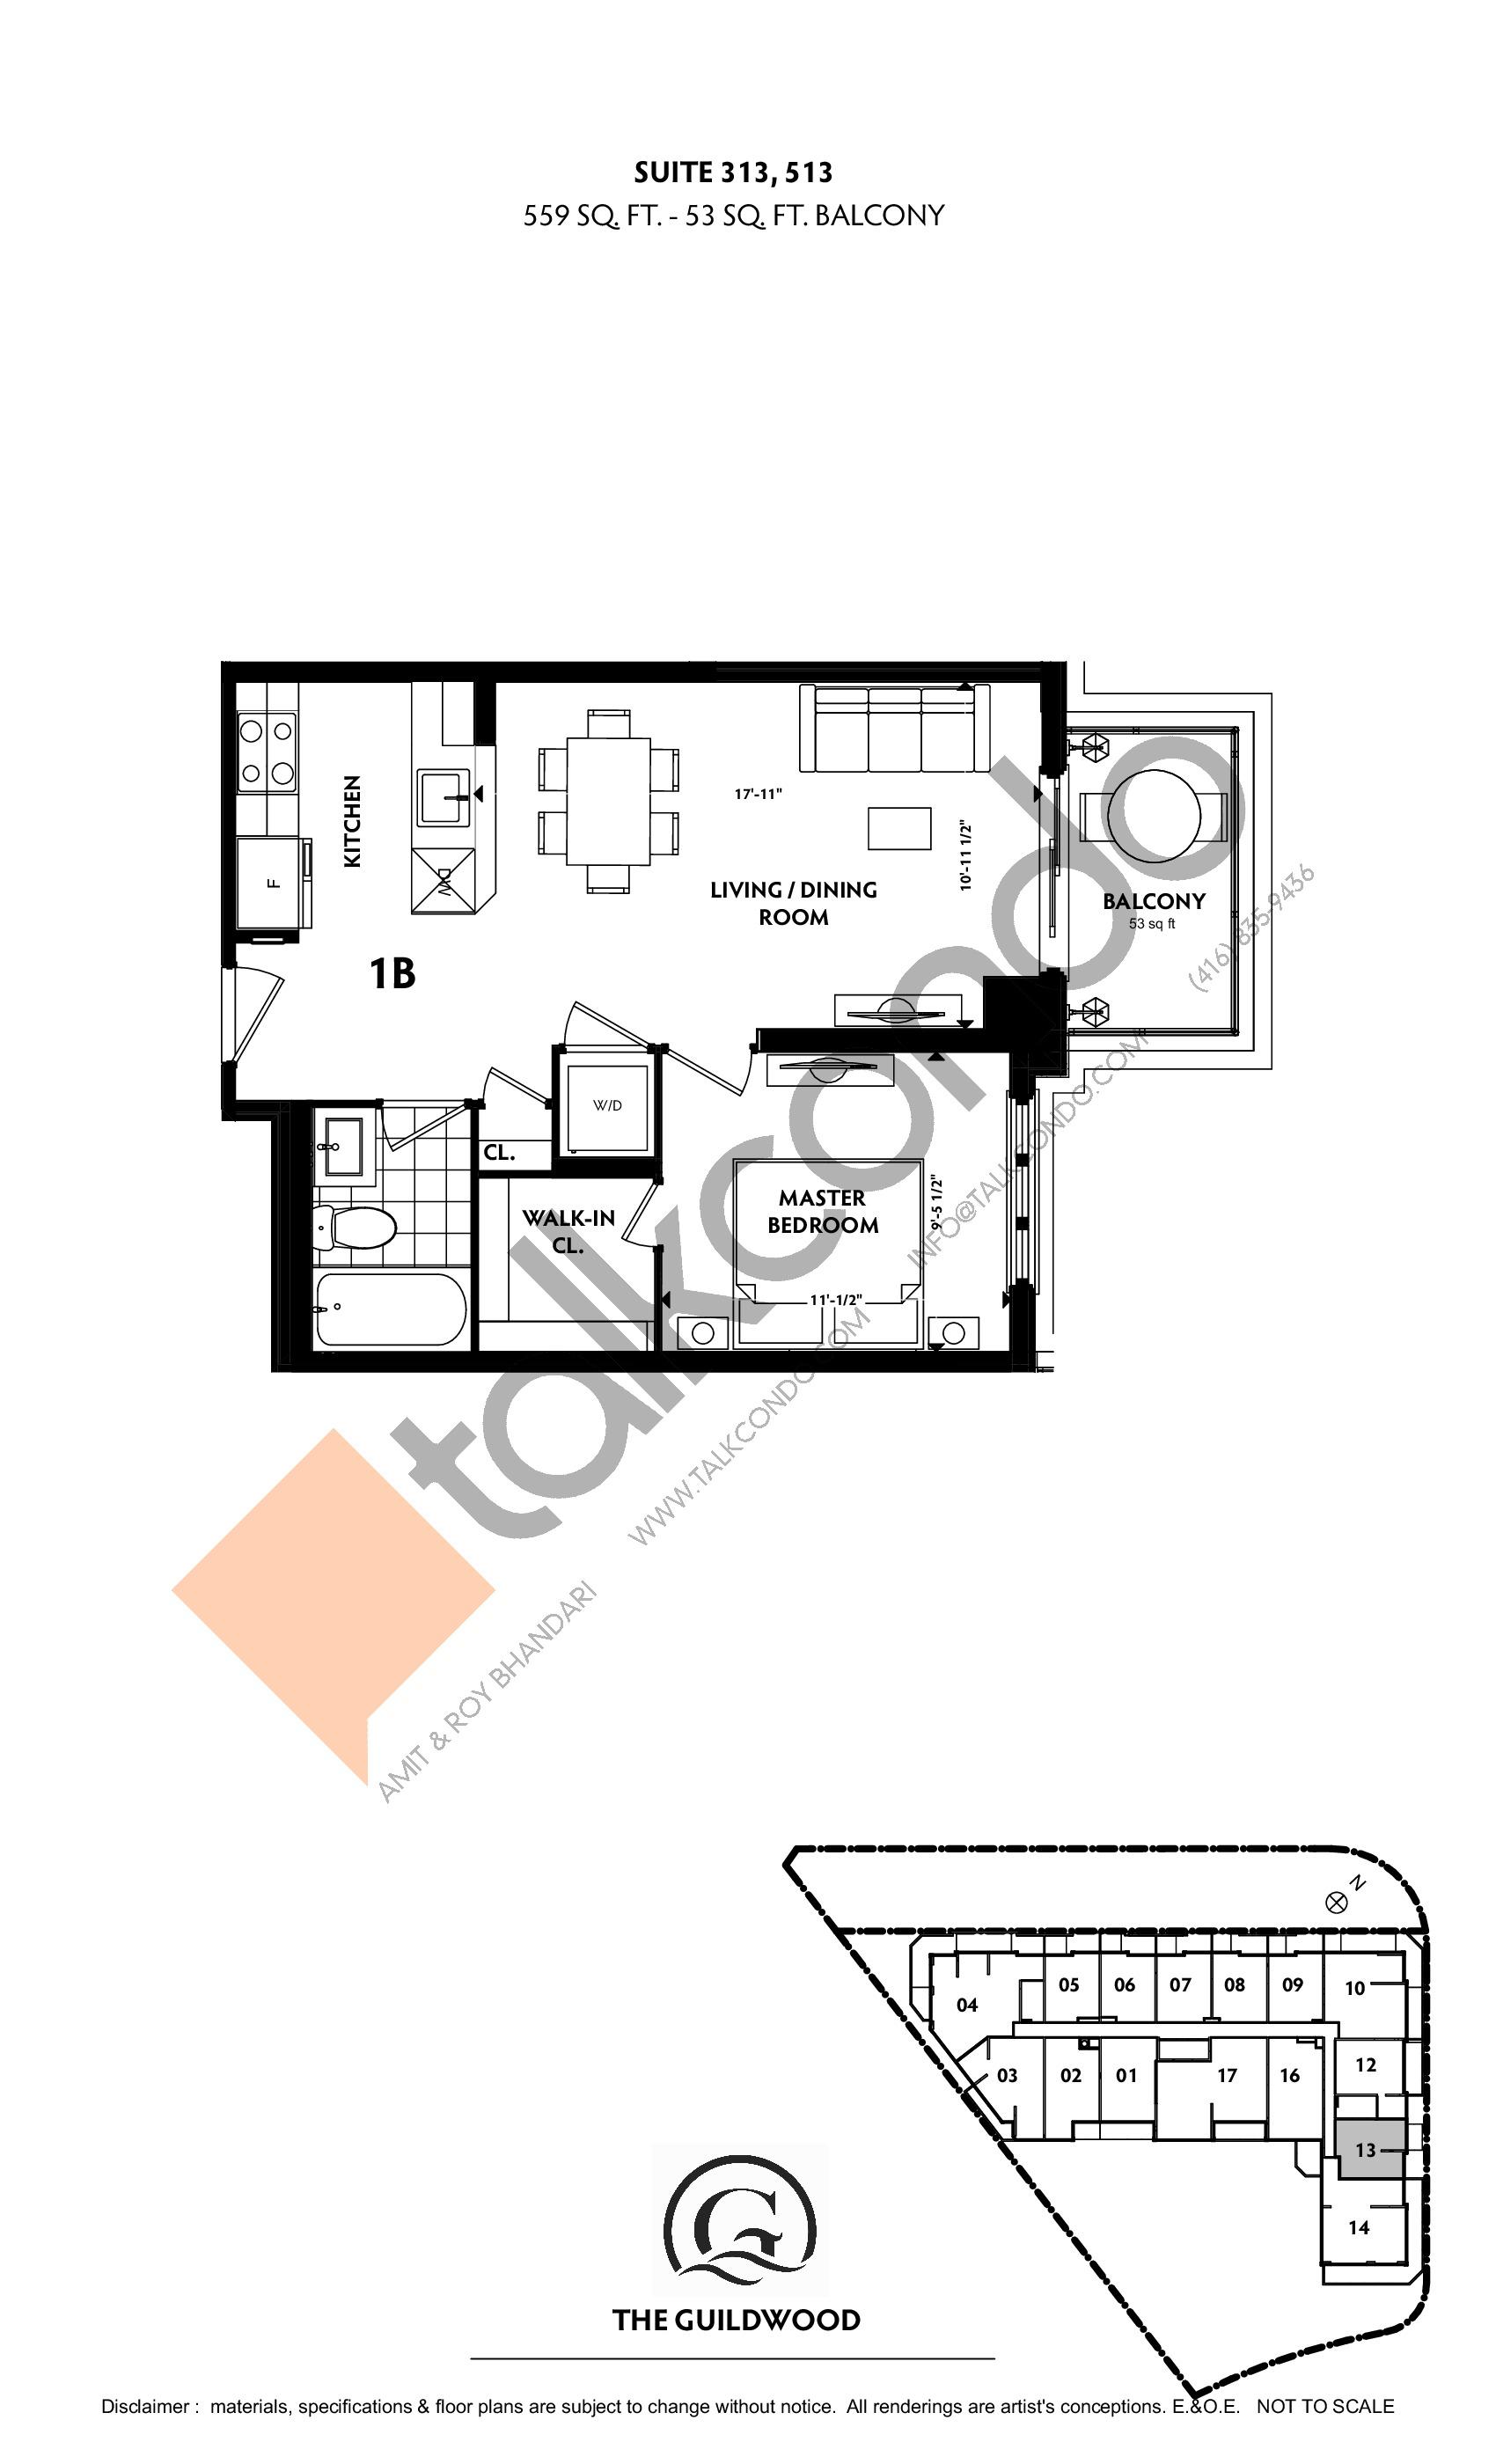 Suite 313, 513 Floor Plan at Guildwood Condos - 559 sq.ft